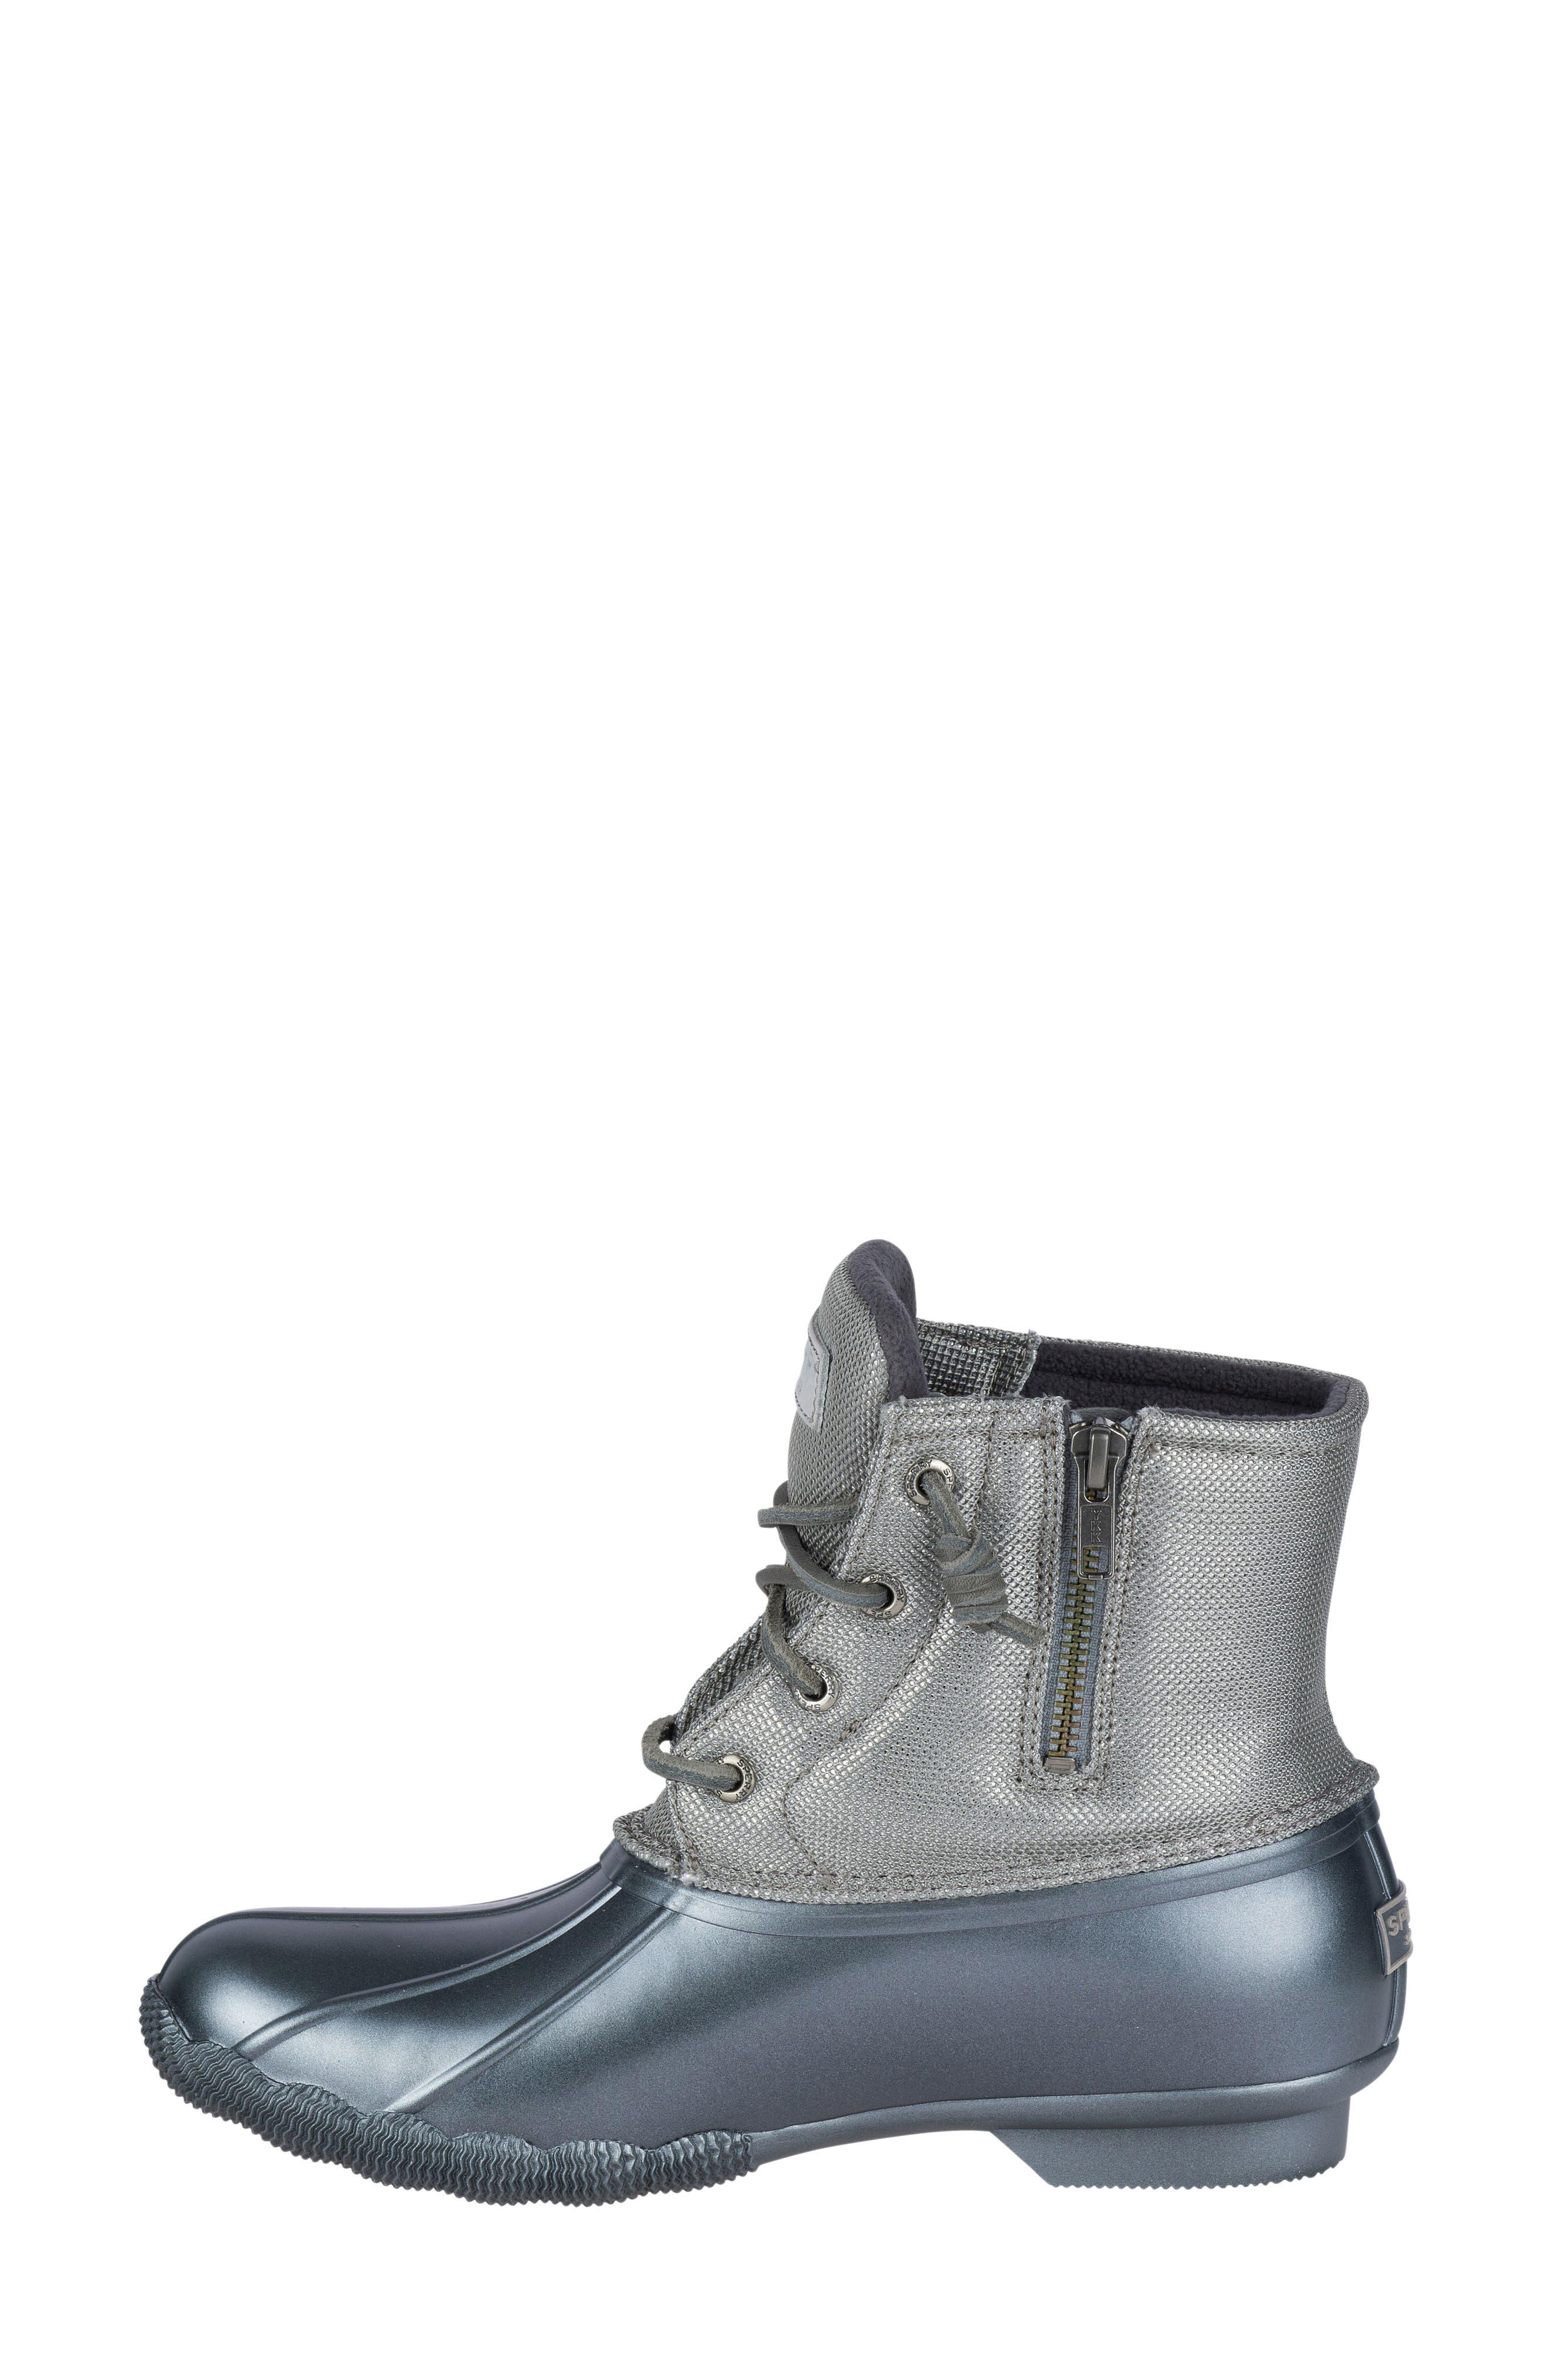 'Saltwater' Waterproof Rain Boot,                             Alternate thumbnail 70, color,